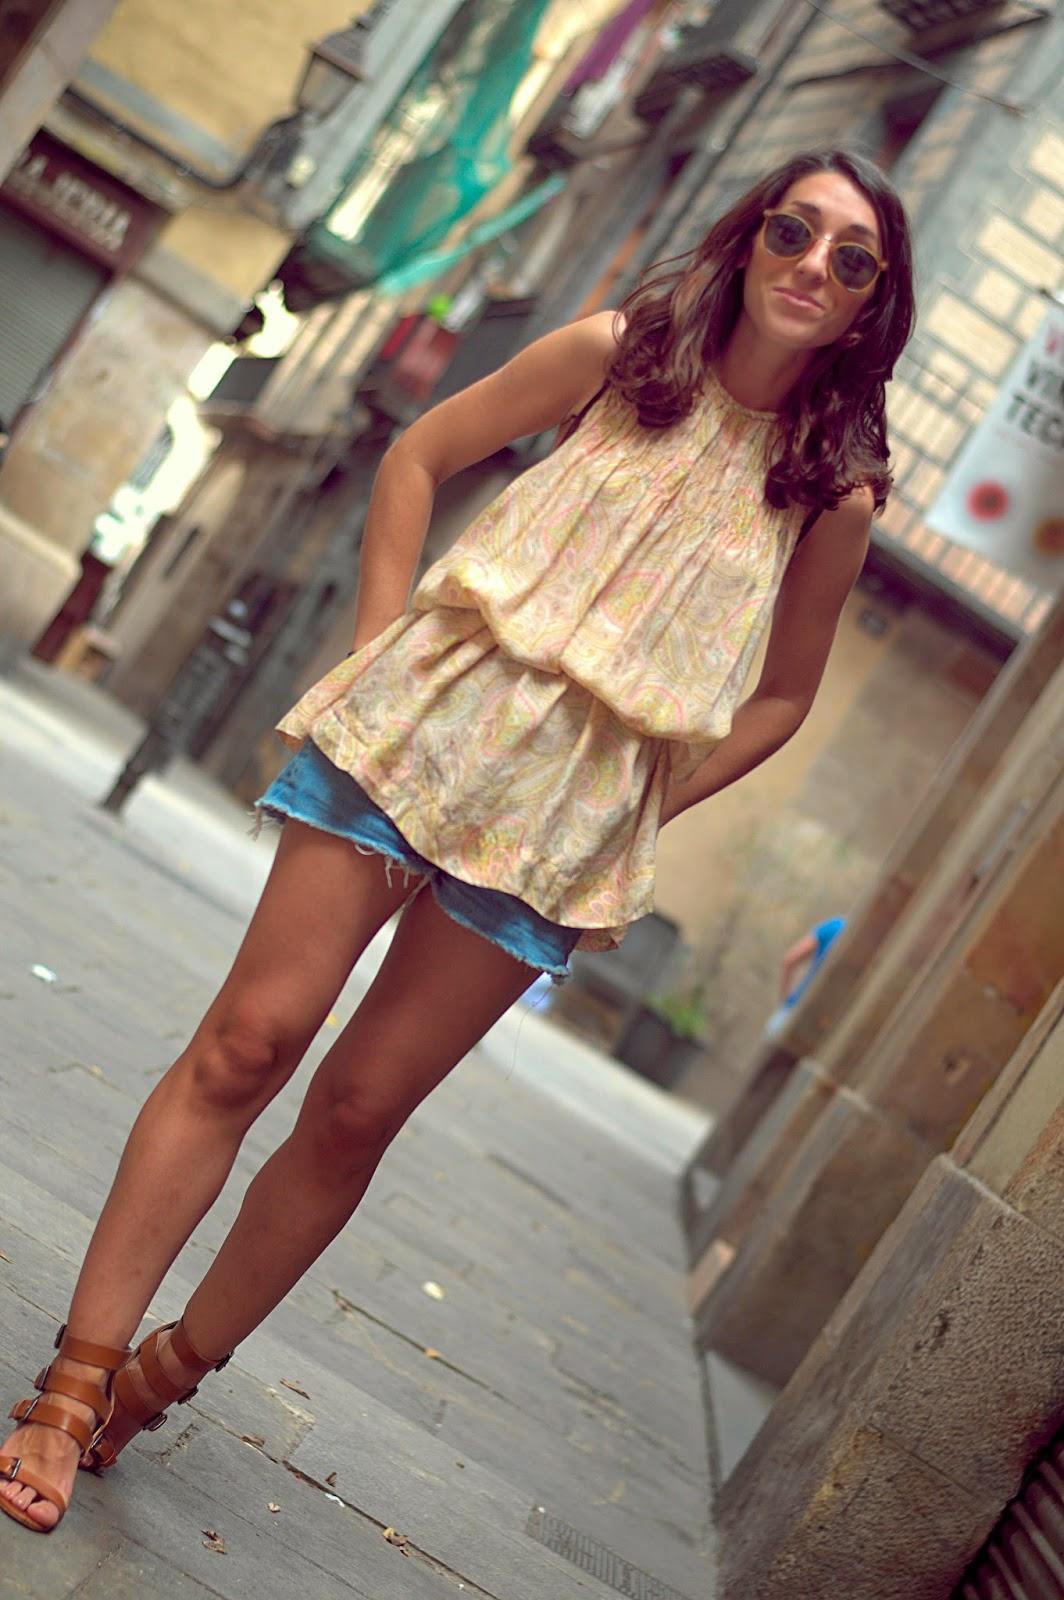 vestido zara, shorts levi's, bolso vintage, pulseras, india, sandalias zara, born barcelona